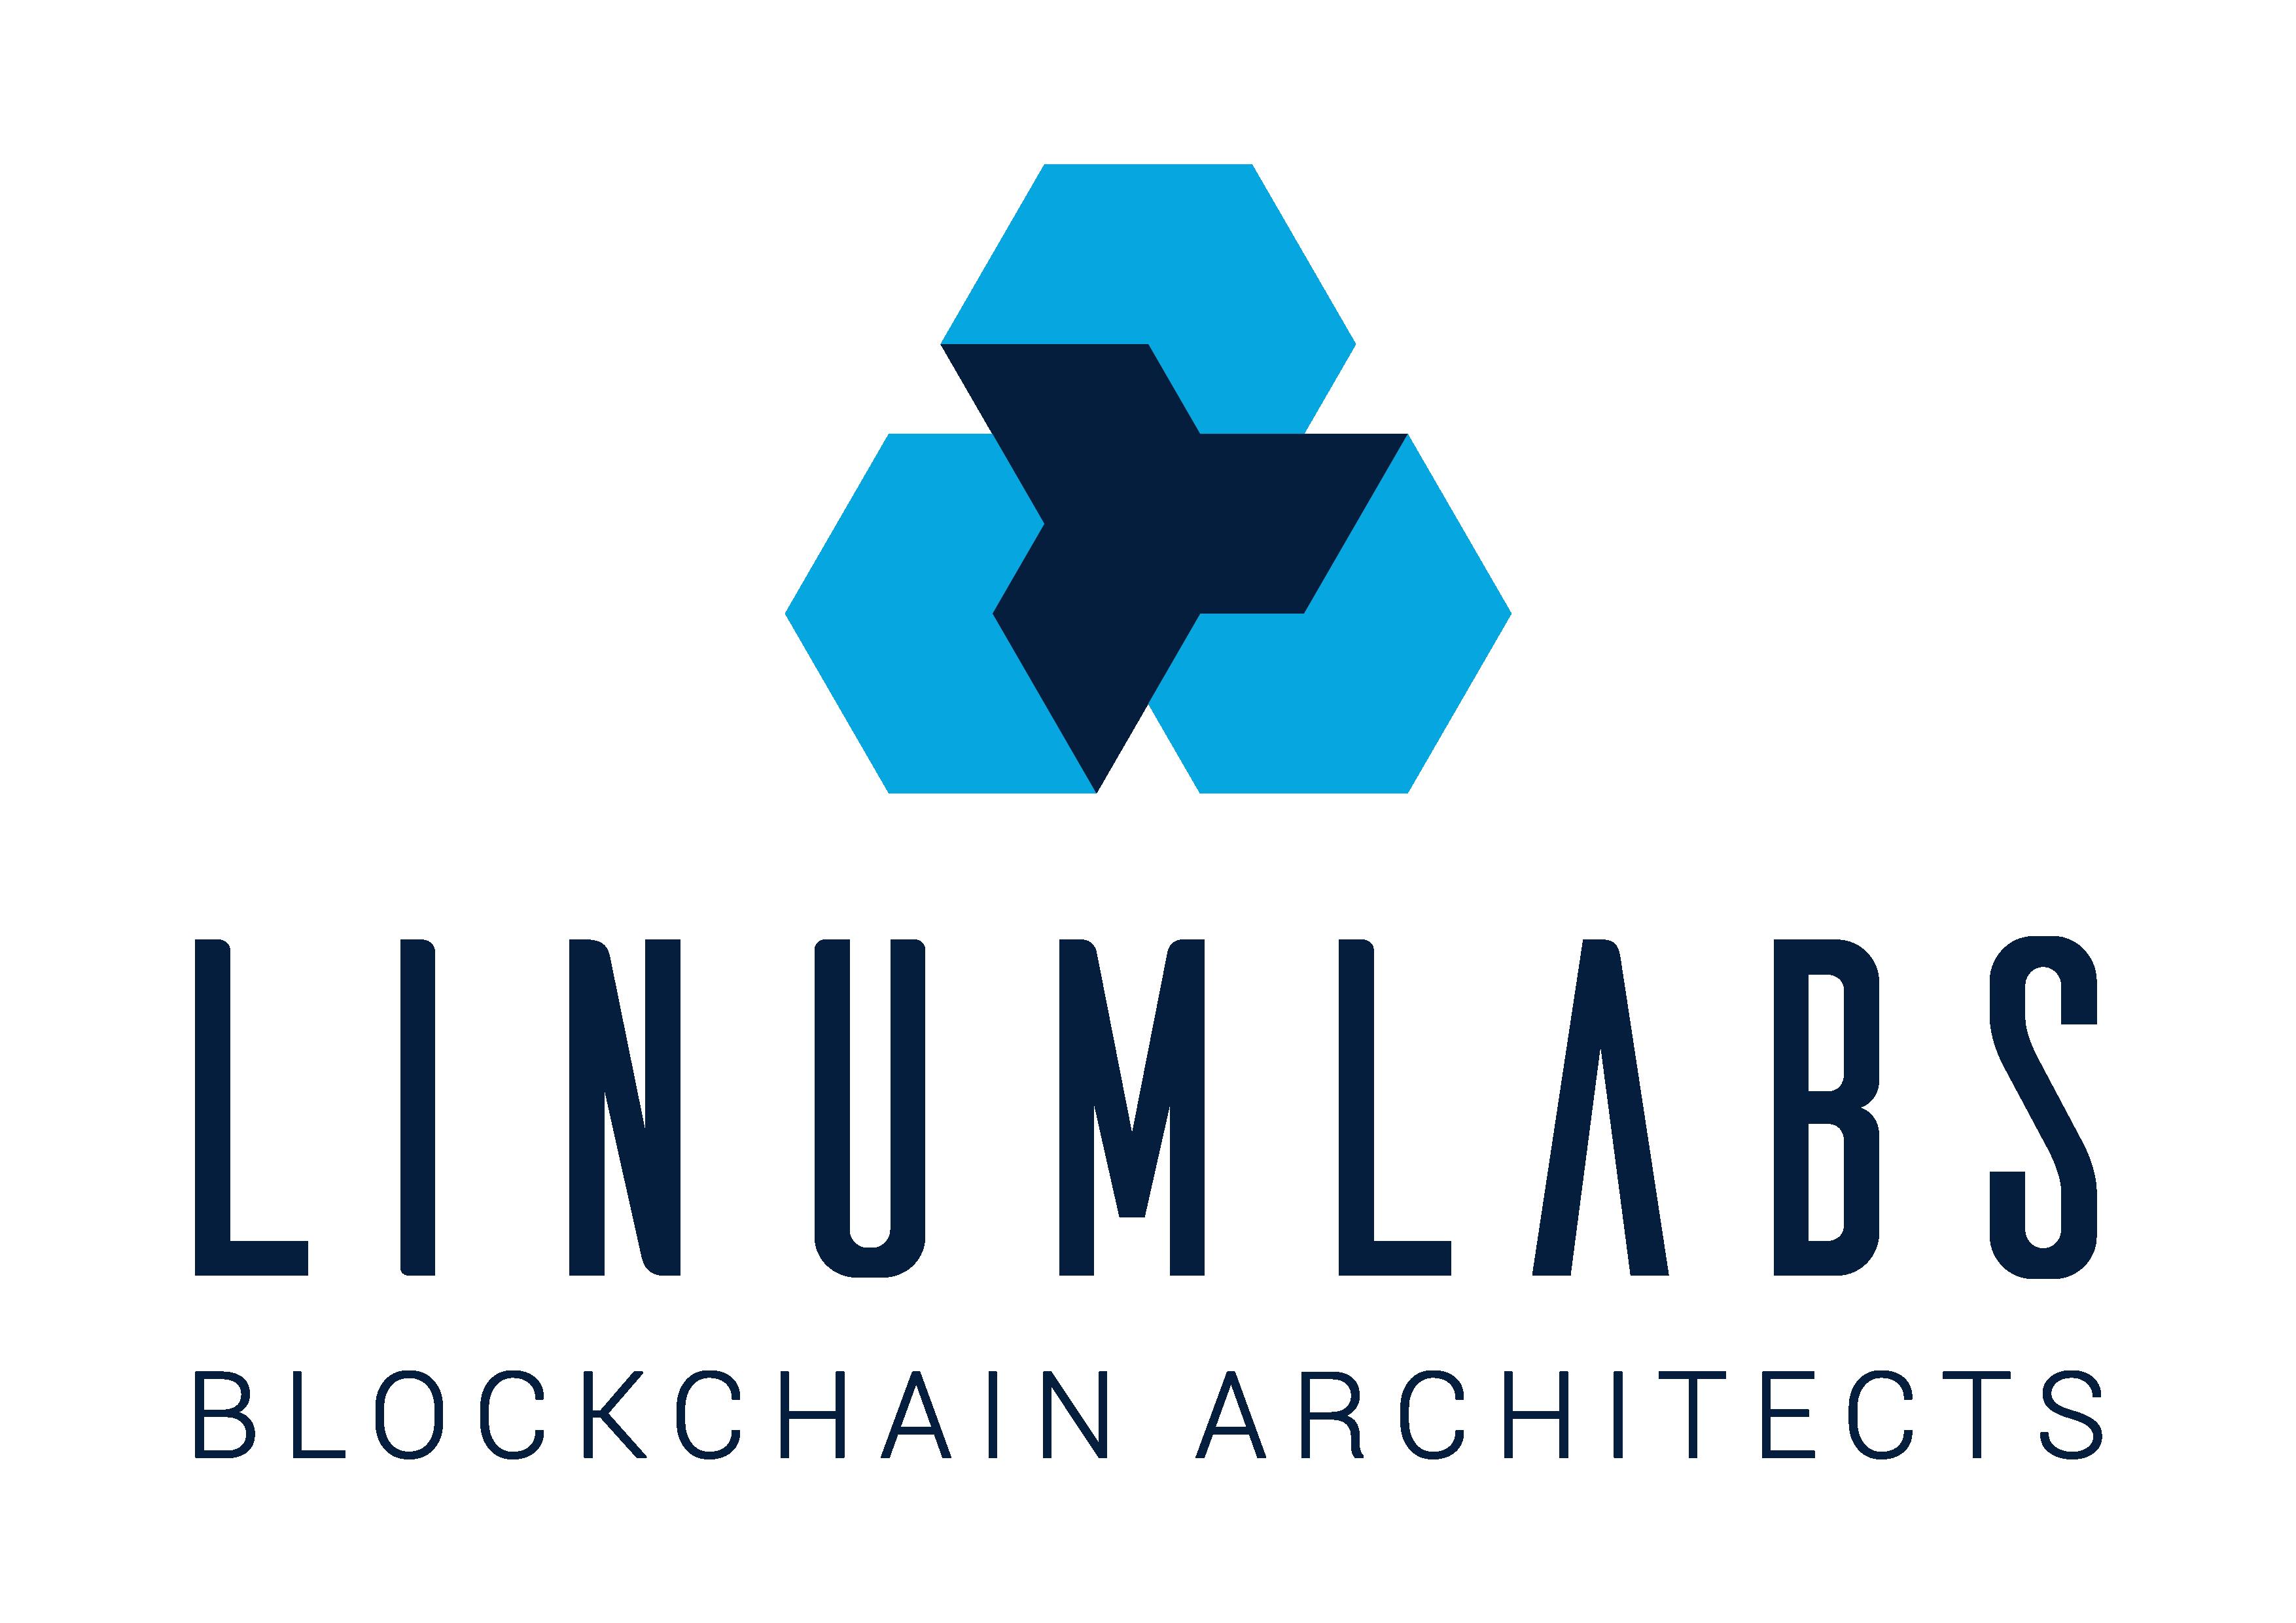 Linum Labs